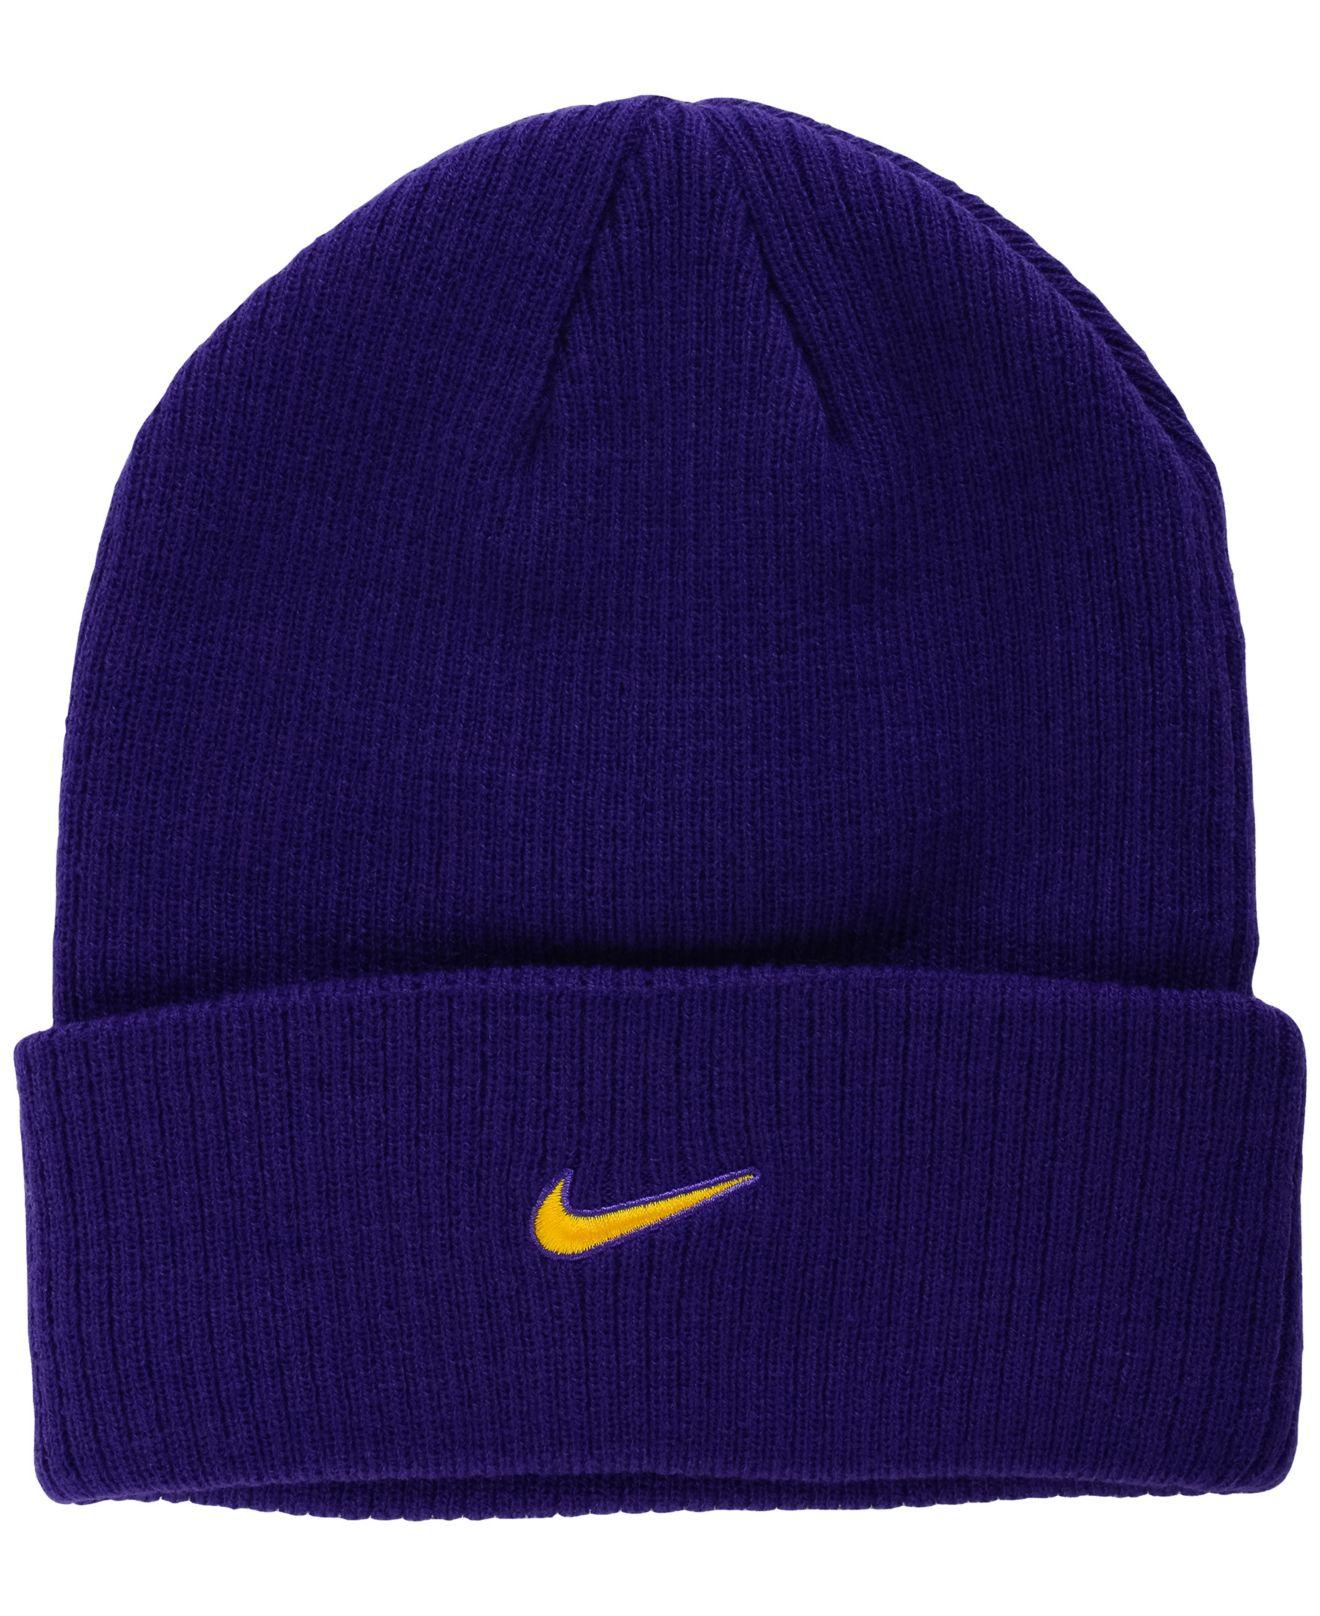 timeless design bcfeb ae25c Lyst - Nike Lsu Tigers Flash Knit Hat in Purple for Men